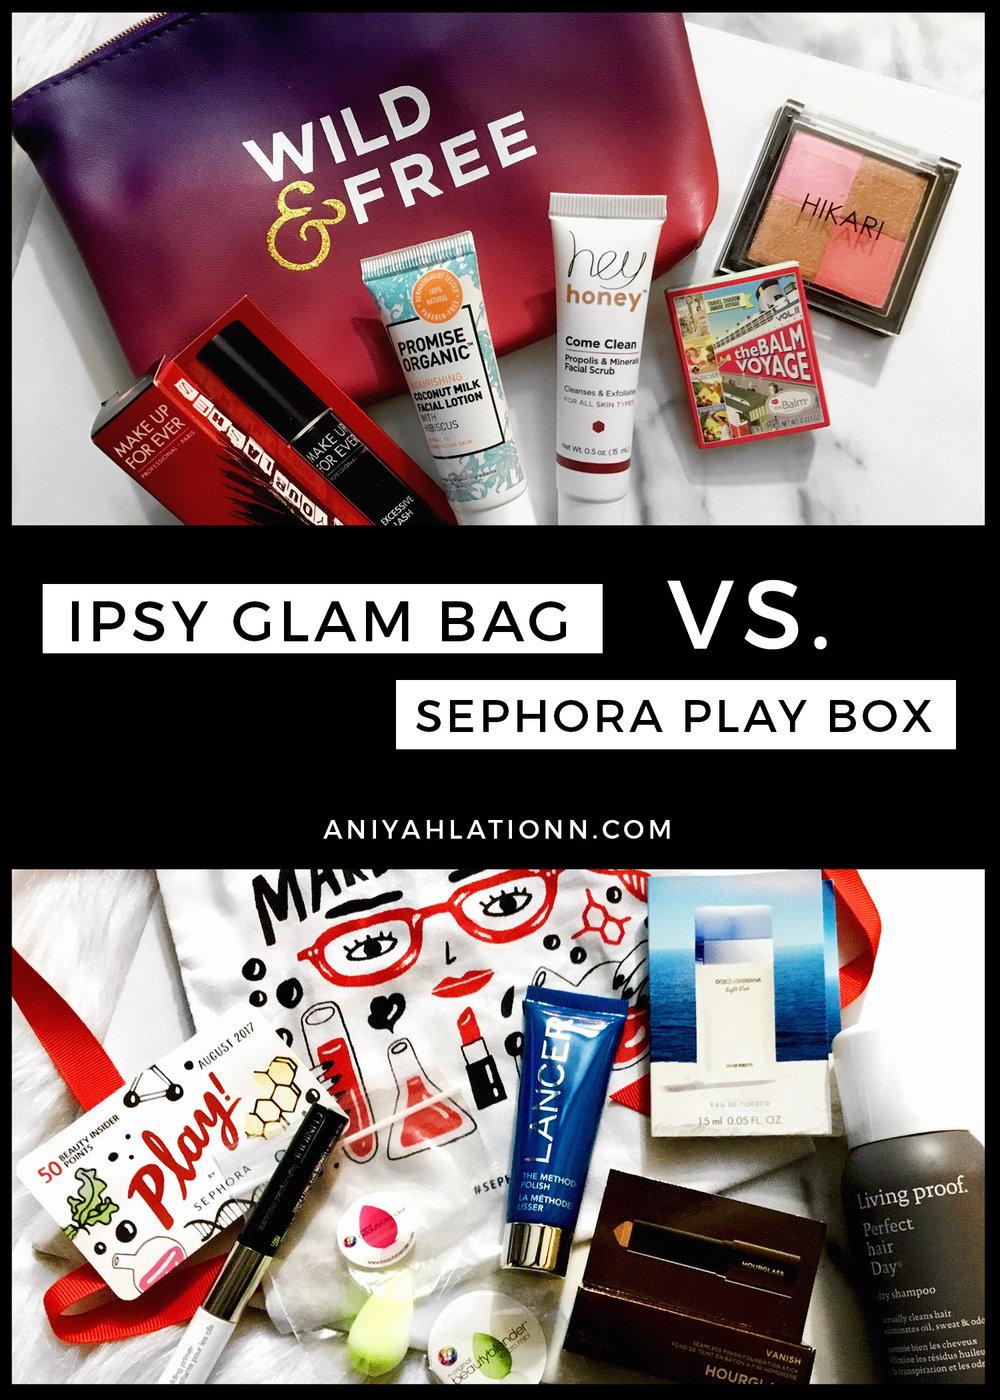 Sephora play Vs Ipsy Main Image.jpg